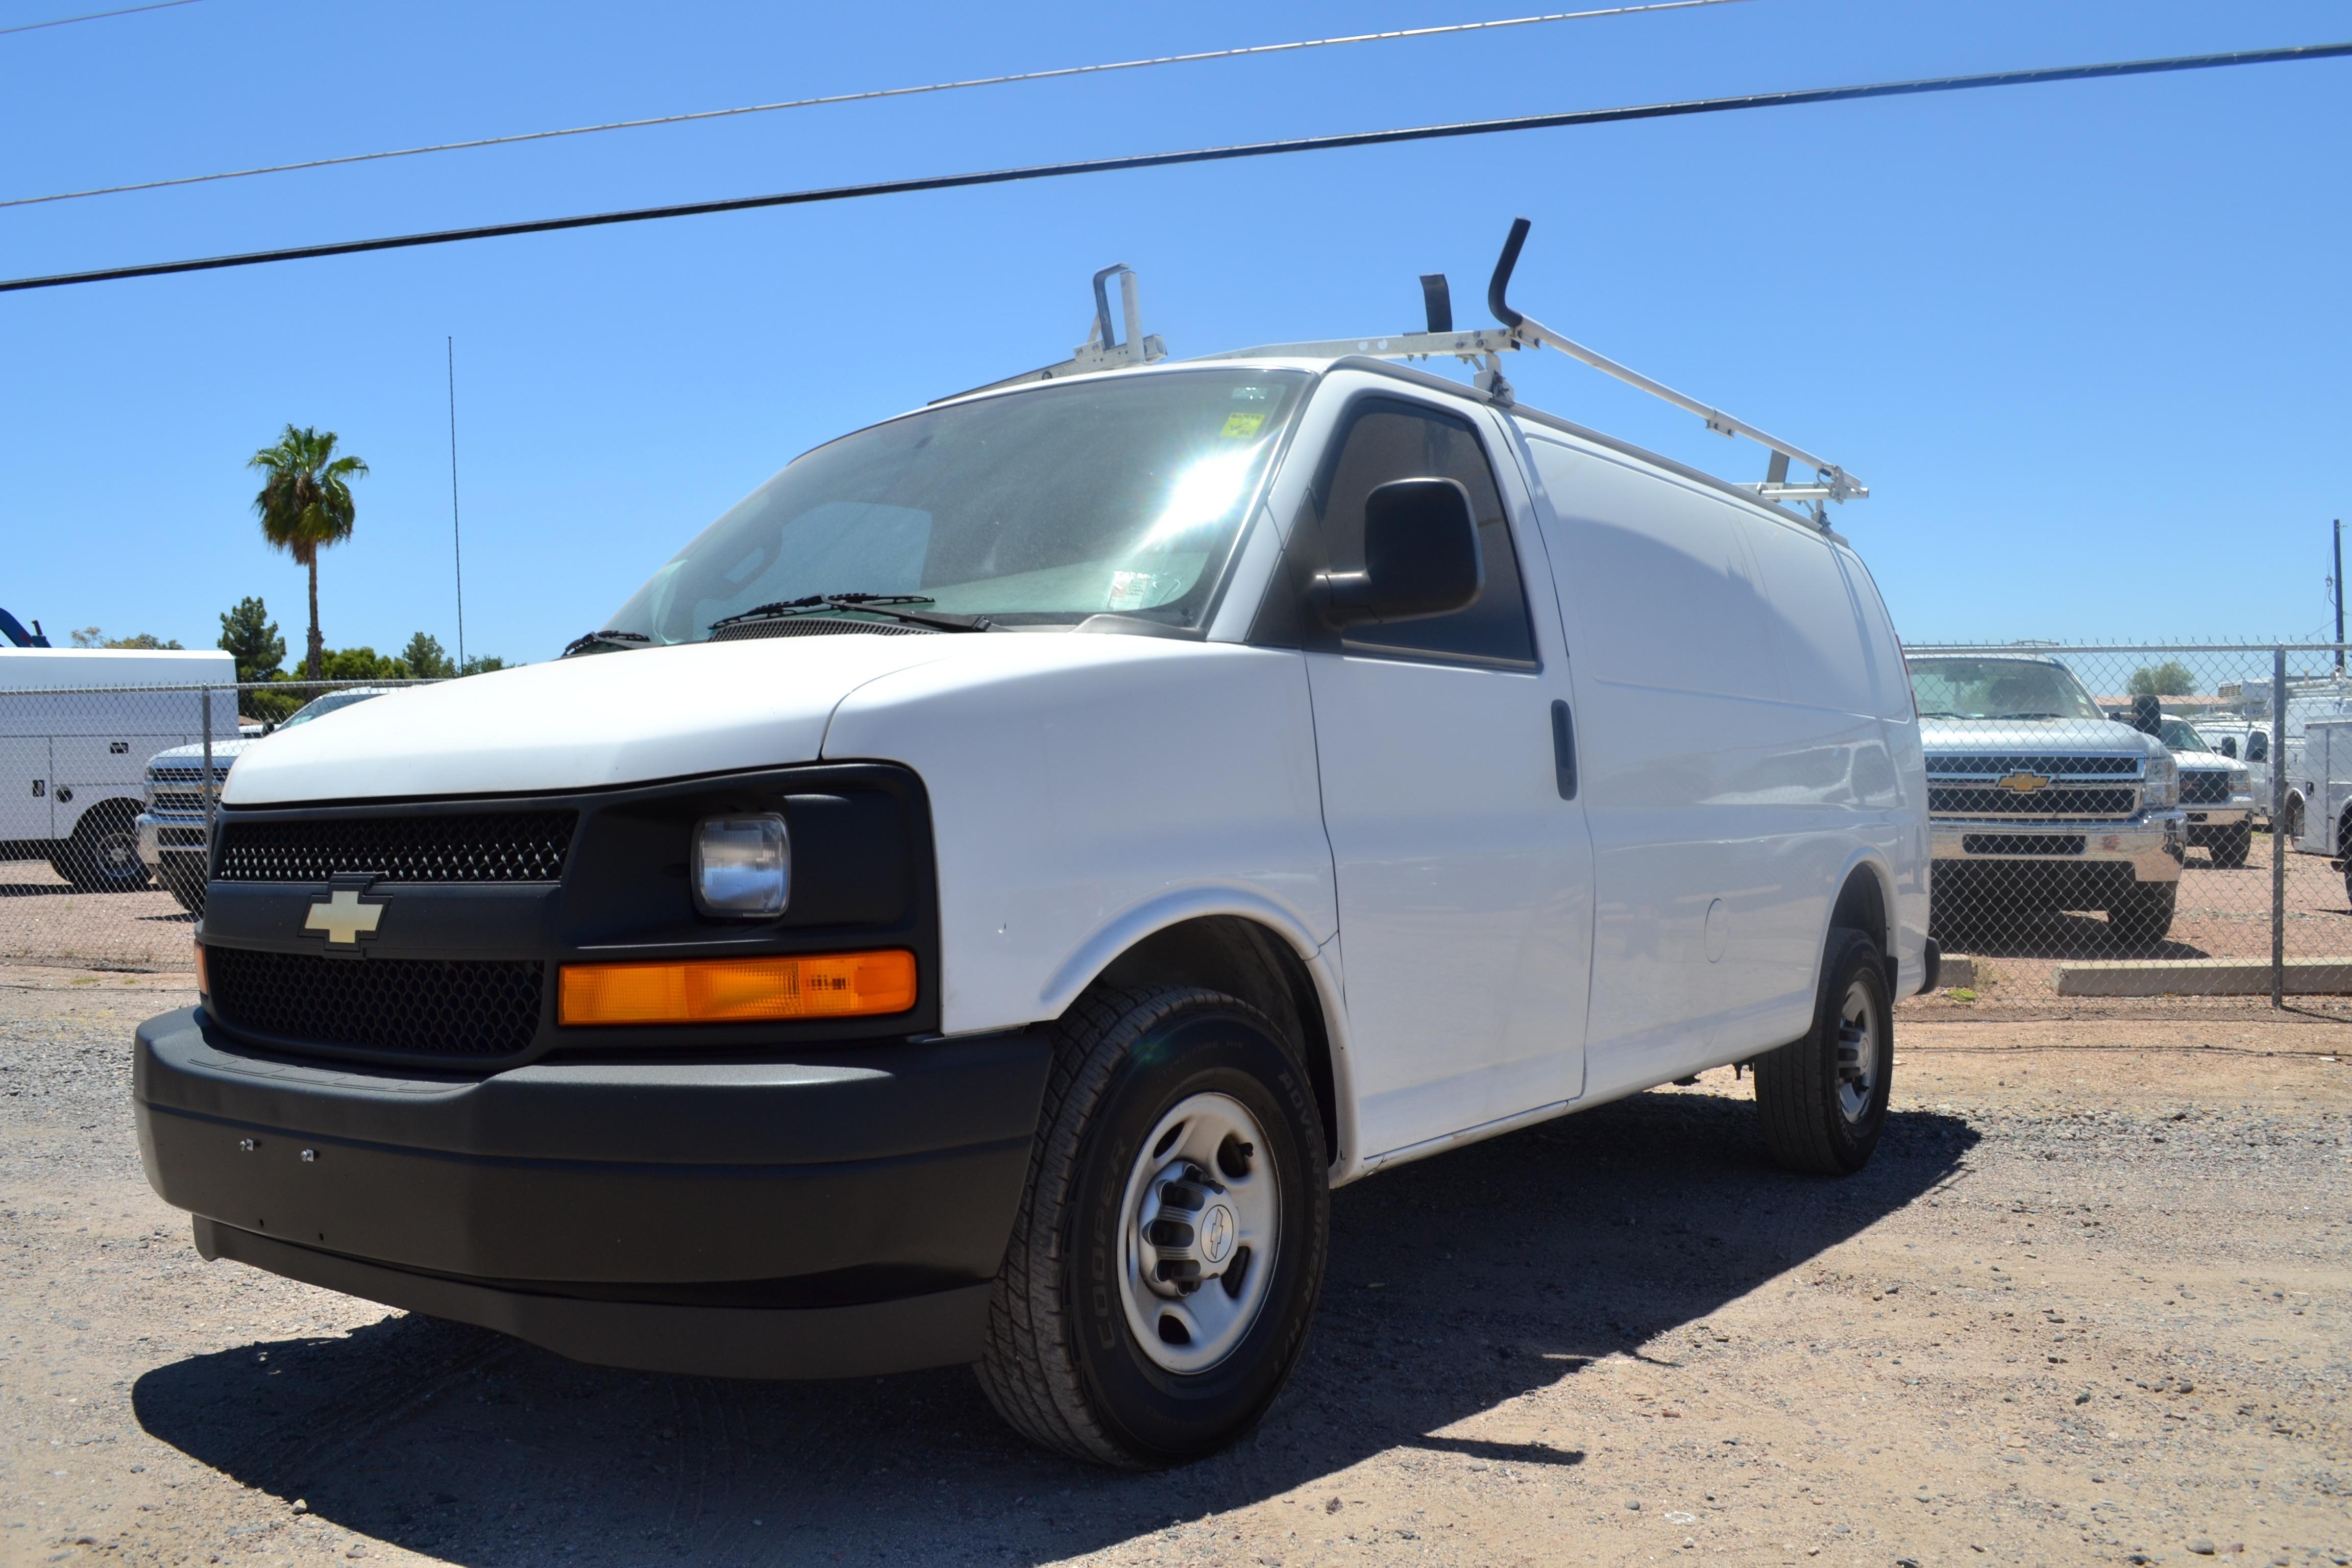 2017 Chevrolet Express Cargo Van Rwd 2500 With Ladder Rack And Tool Bins Southwest Work Trucks Dealership In Mesa